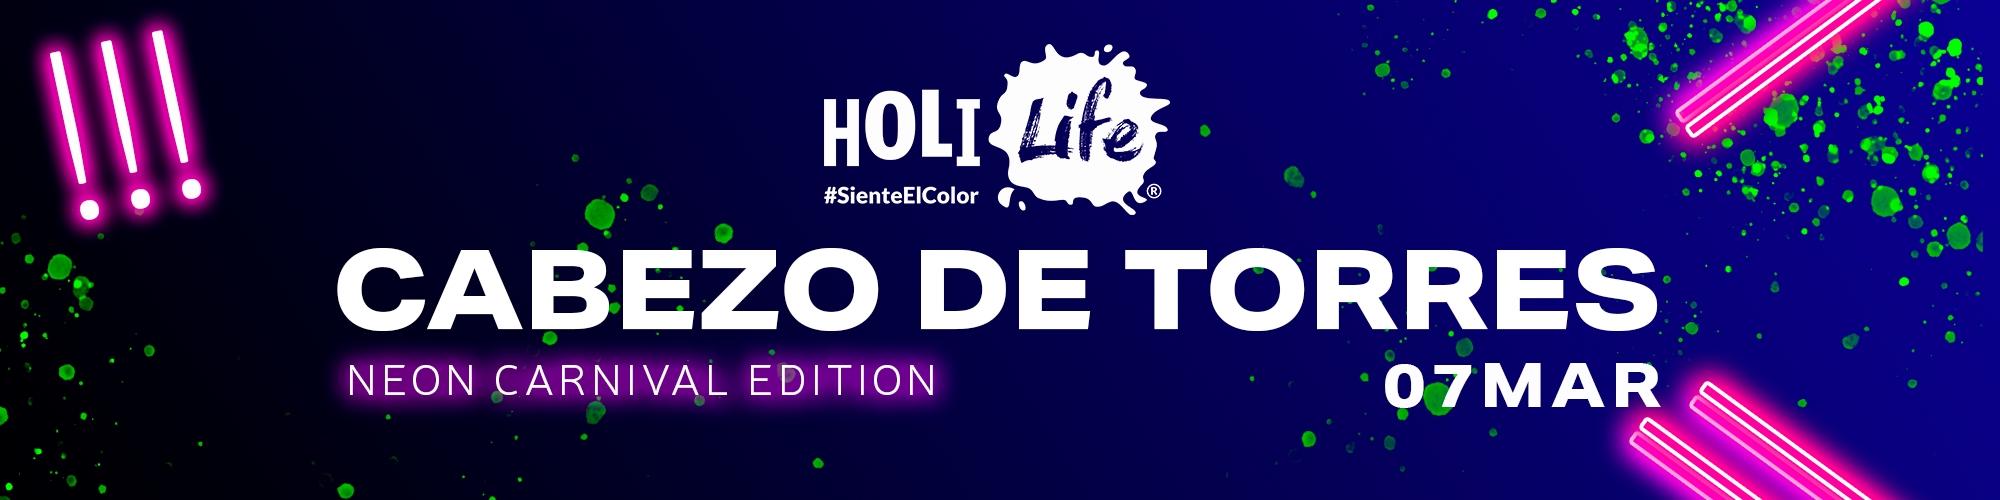 Holi Life Murcia 6th Edition 07-03-2020